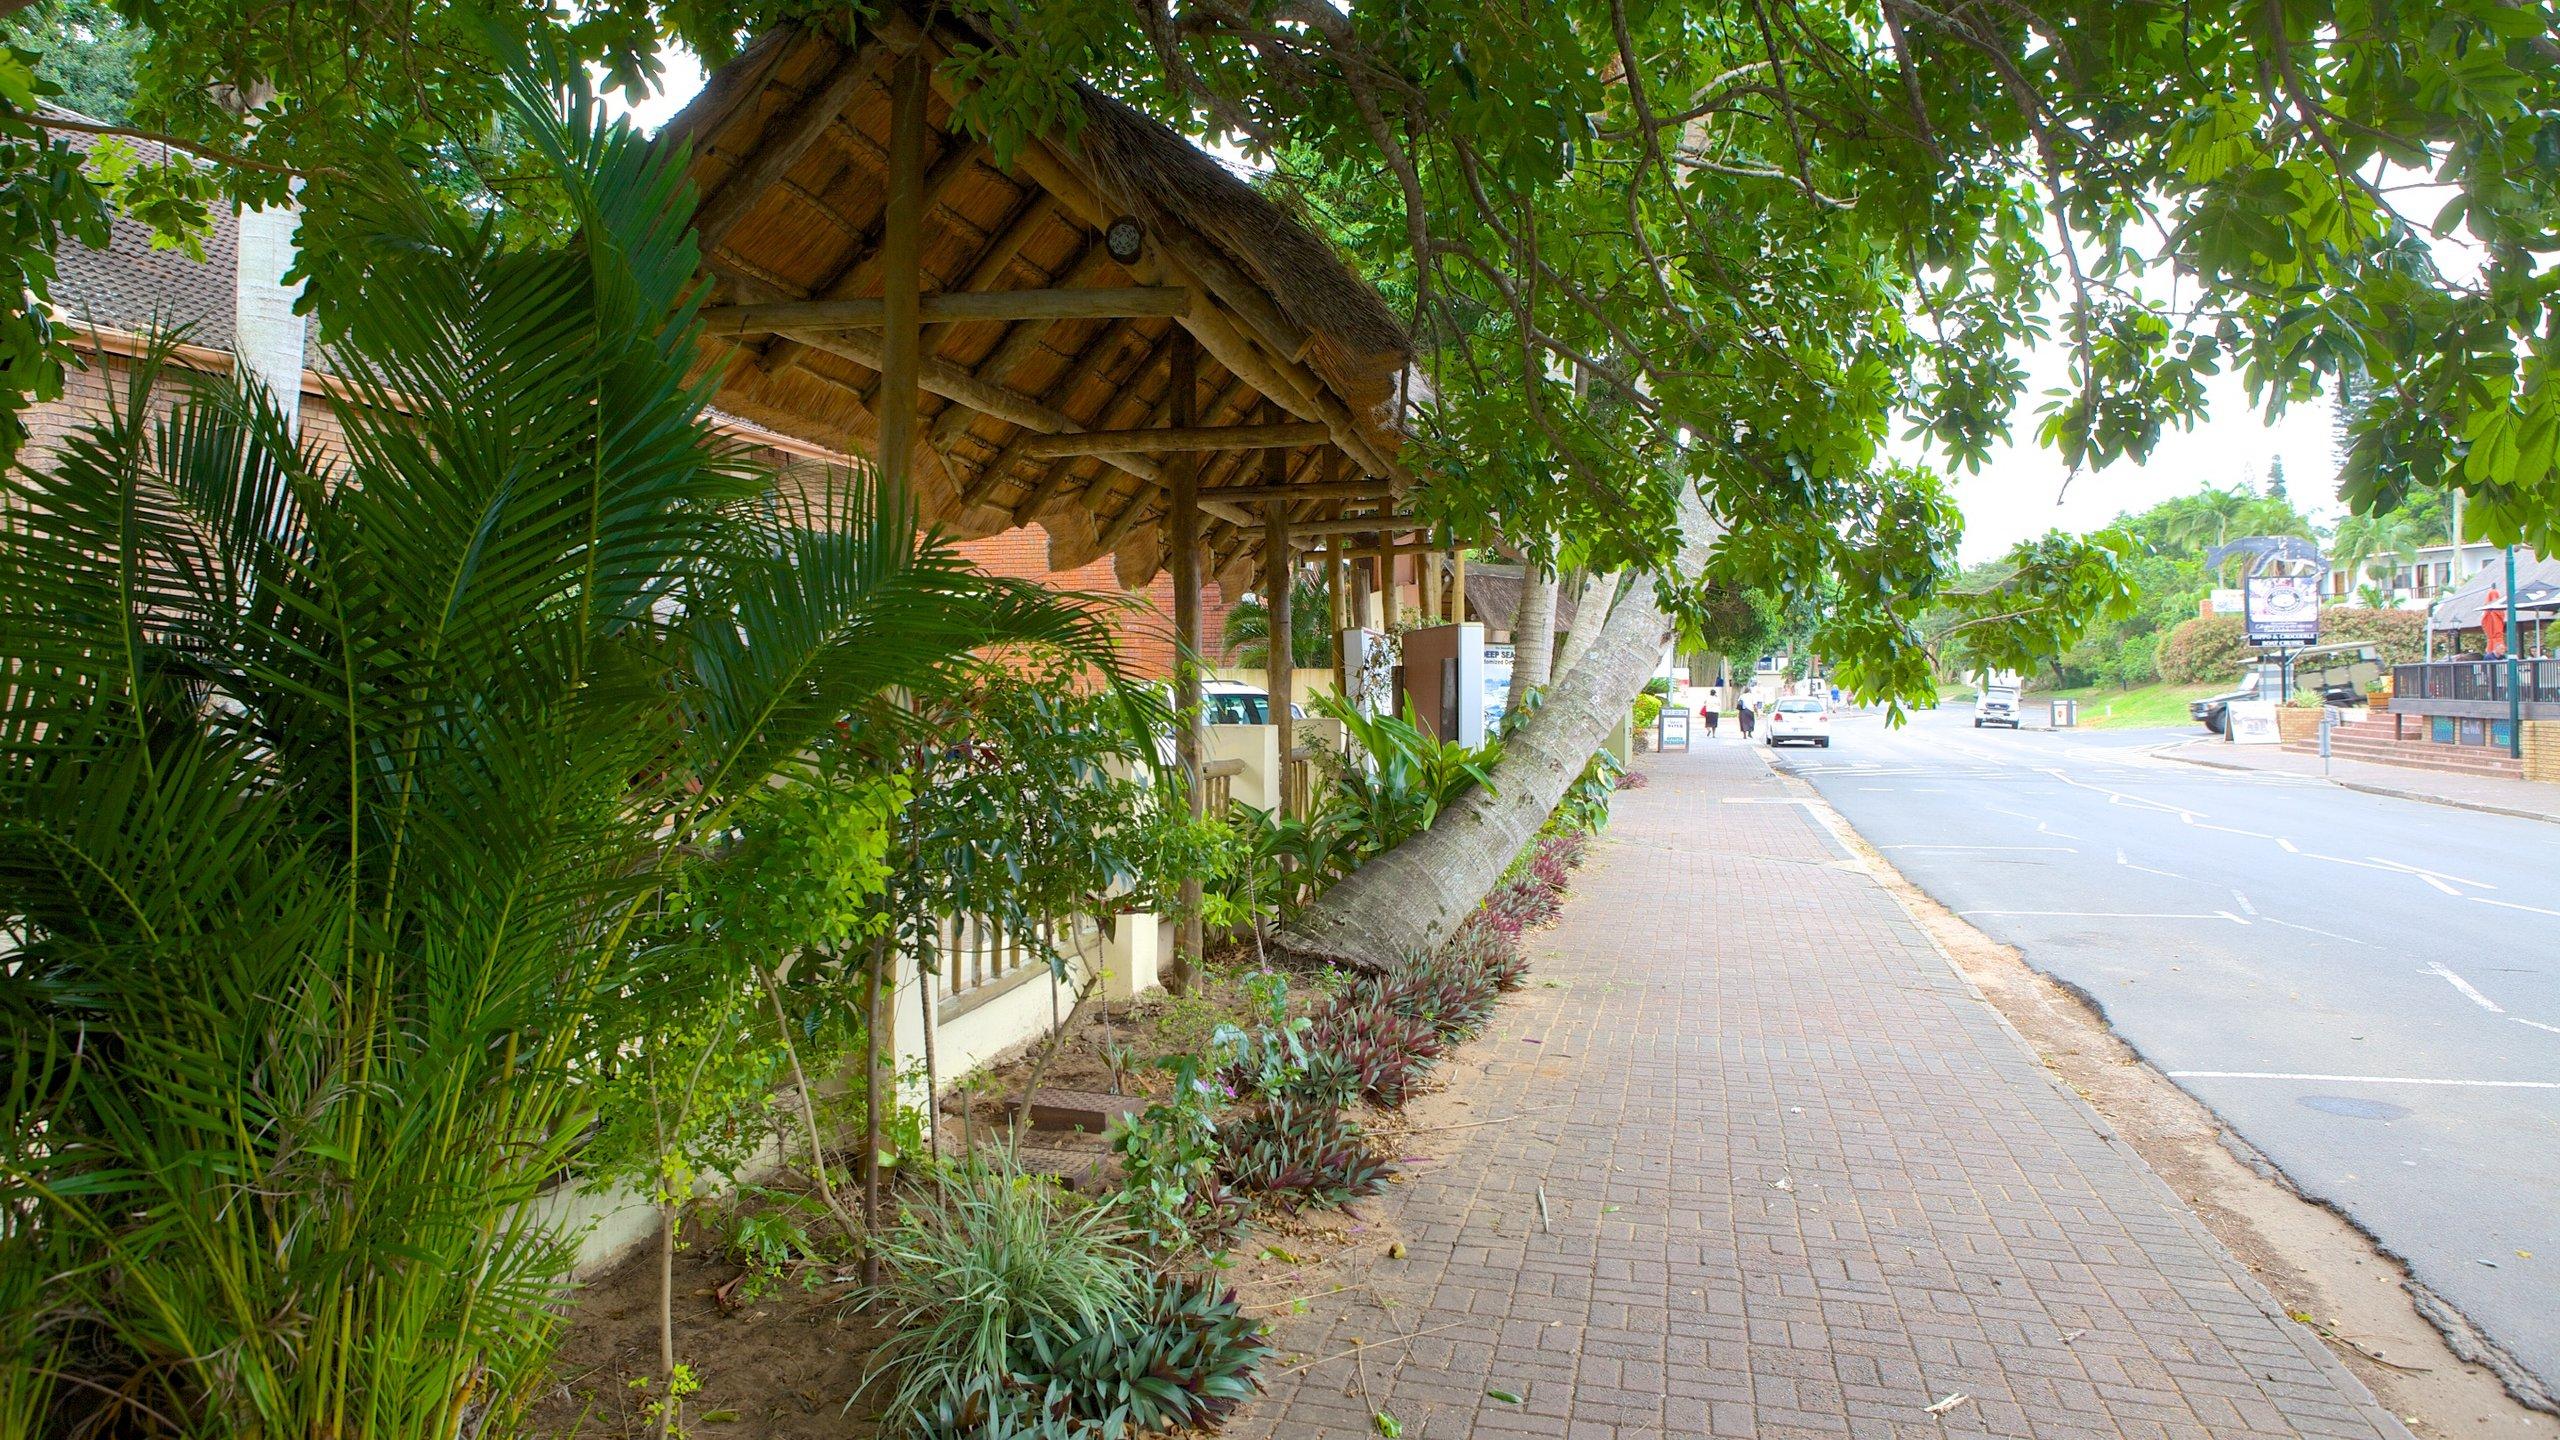 St. Lucia, KwaZulu-Natal, South Africa